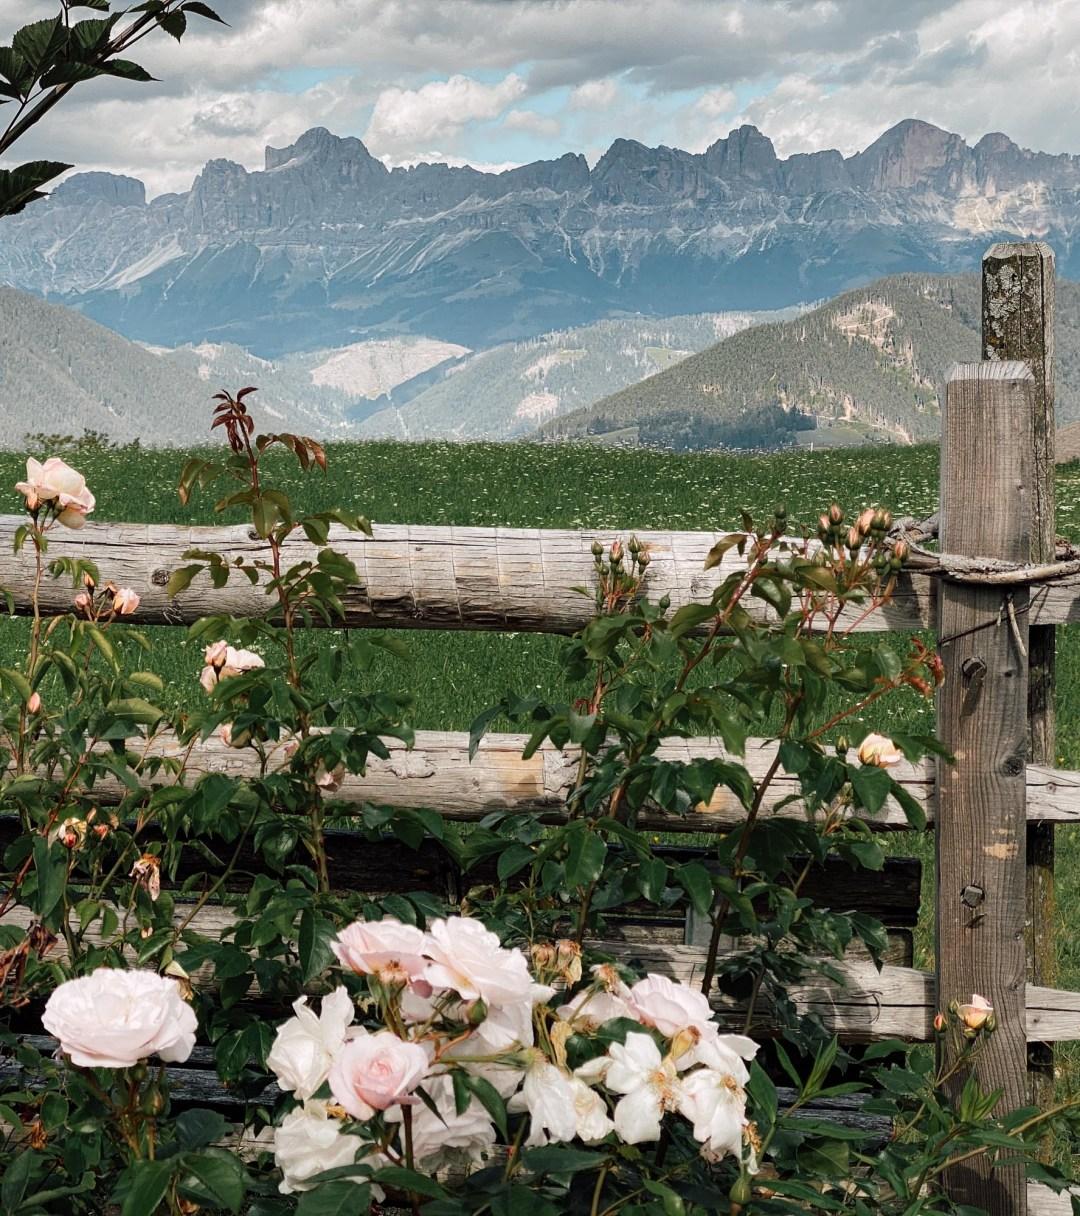 Inastil, Südtirol, Vitalpinahotels, Pflösl, Deutschnofen, Eggental, Latemar, Dolomiten, Travelblogger, Ü50Blogger, Urlaub, Ü50Lifestyle, Reiseblogger, Ü50Reisen-21